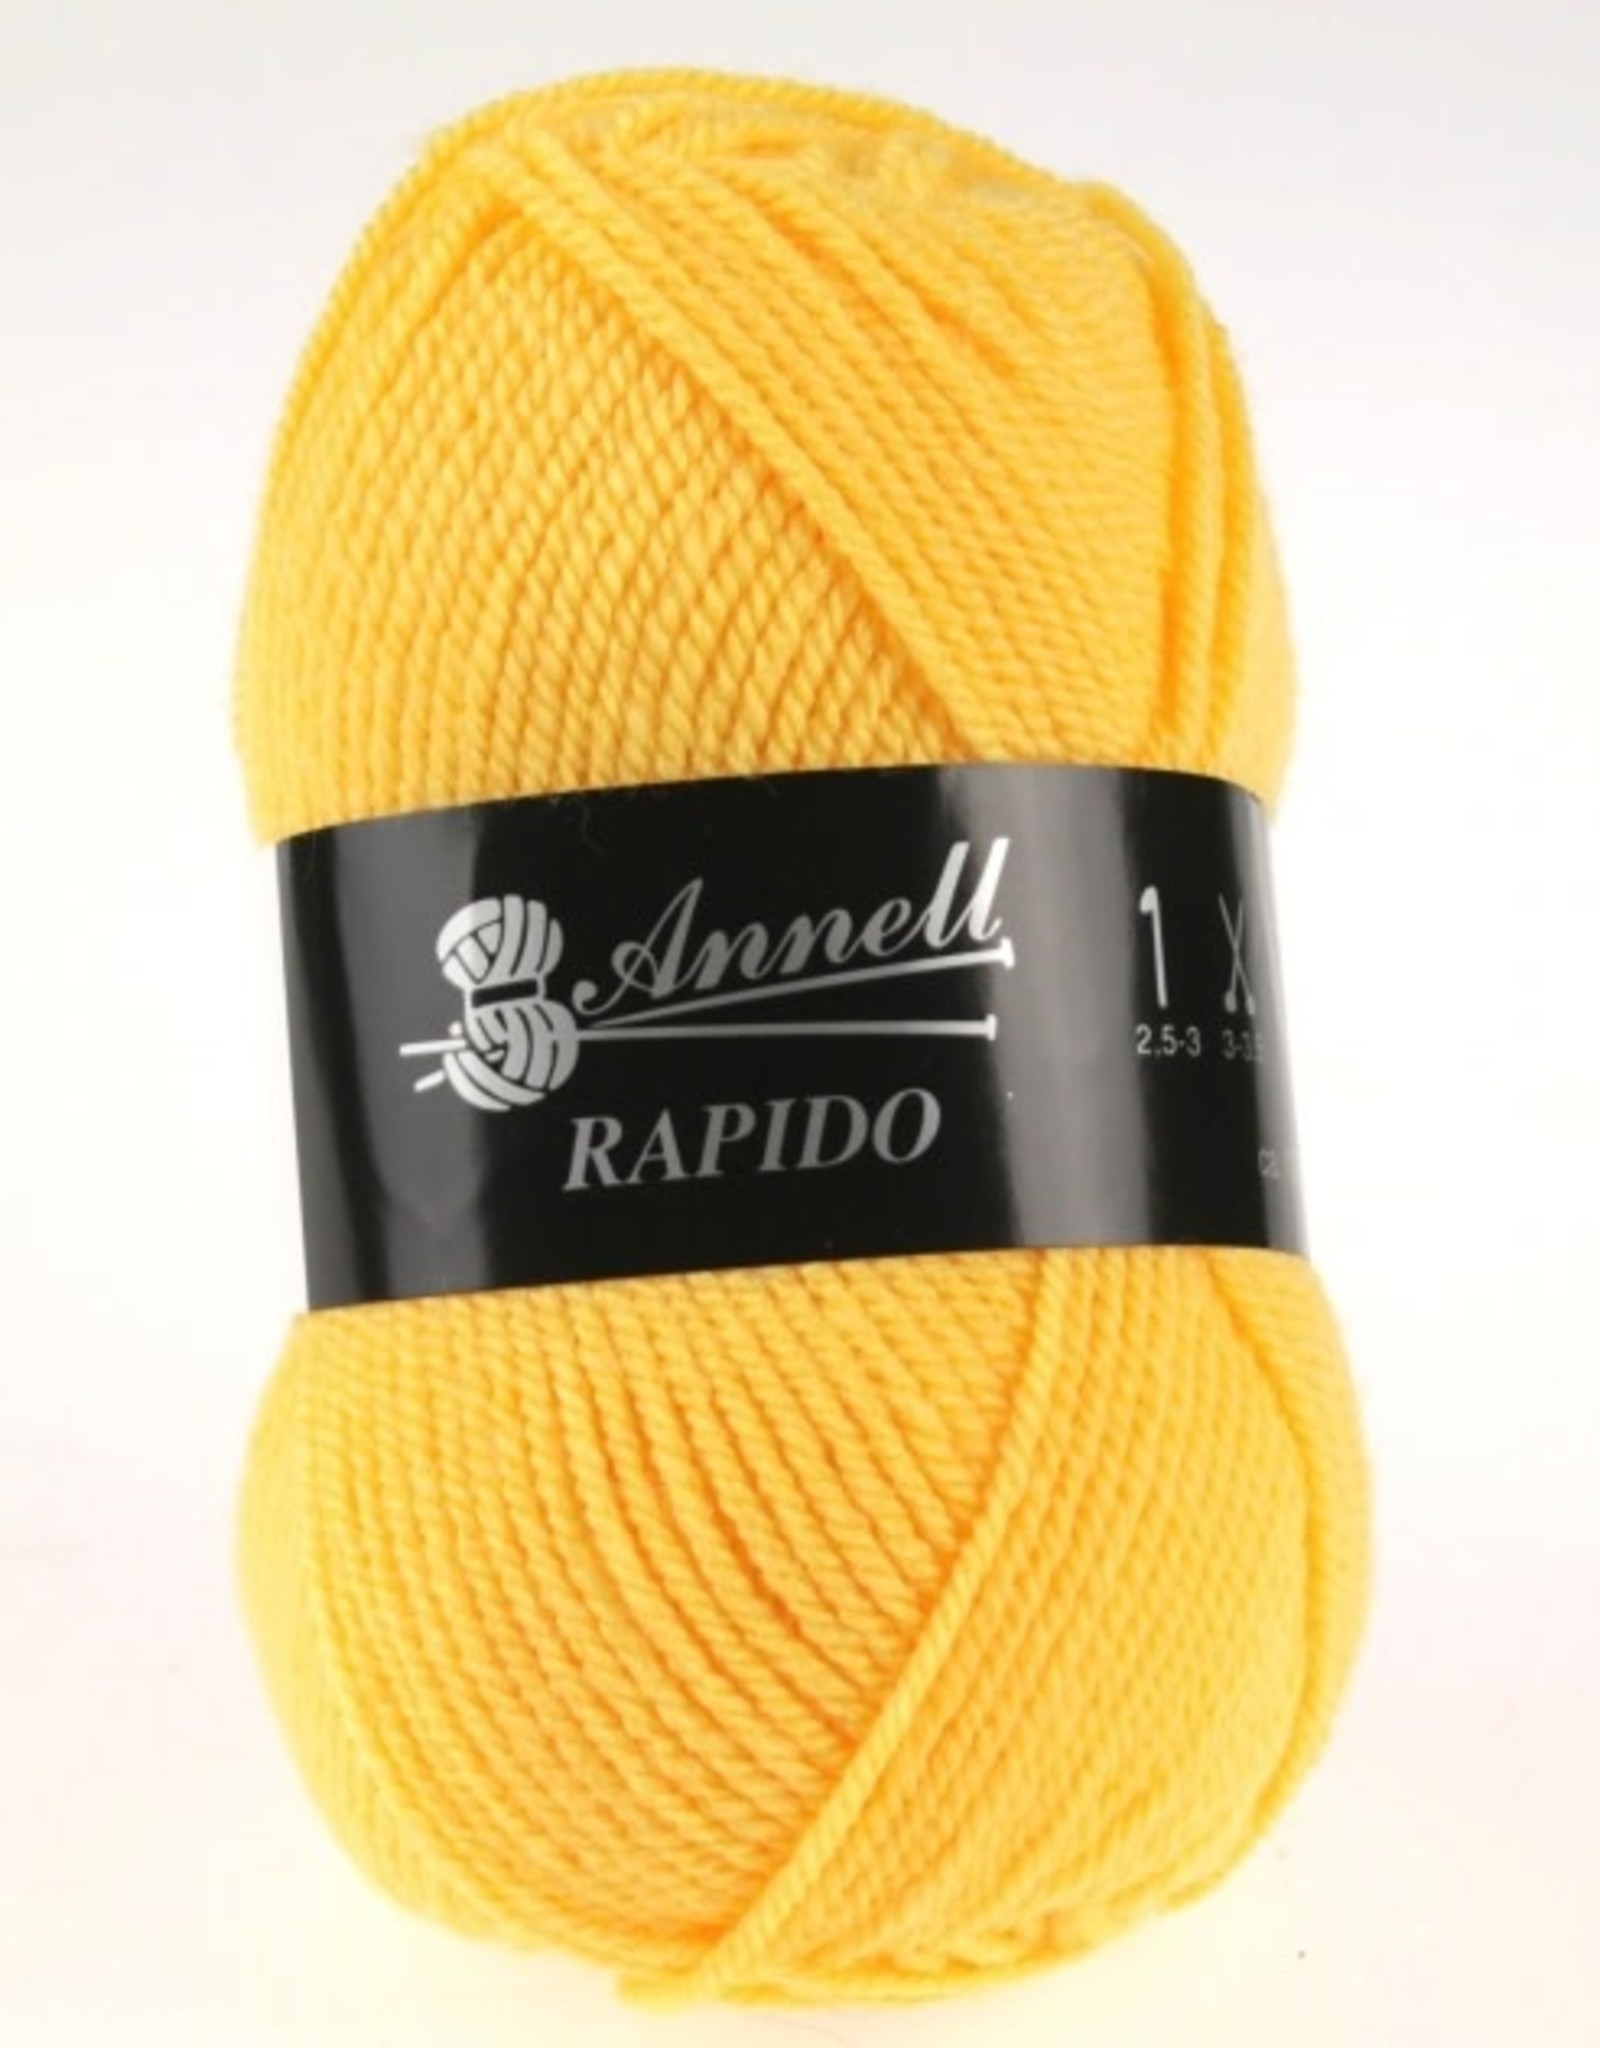 Annell Annell rapido 3215